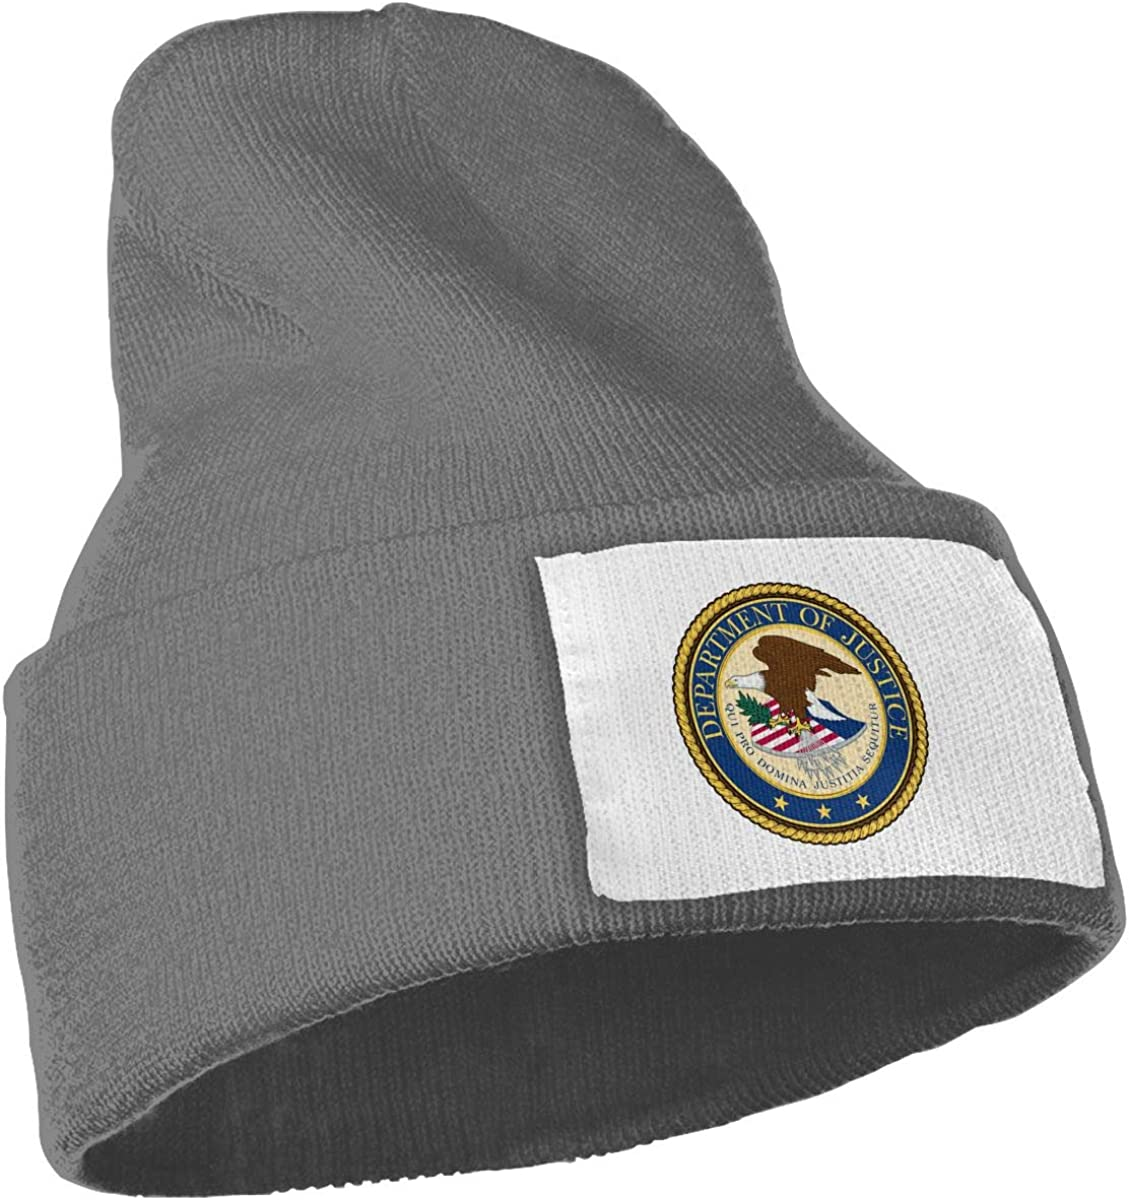 Zml0pping Department of Justice Unisex Cap